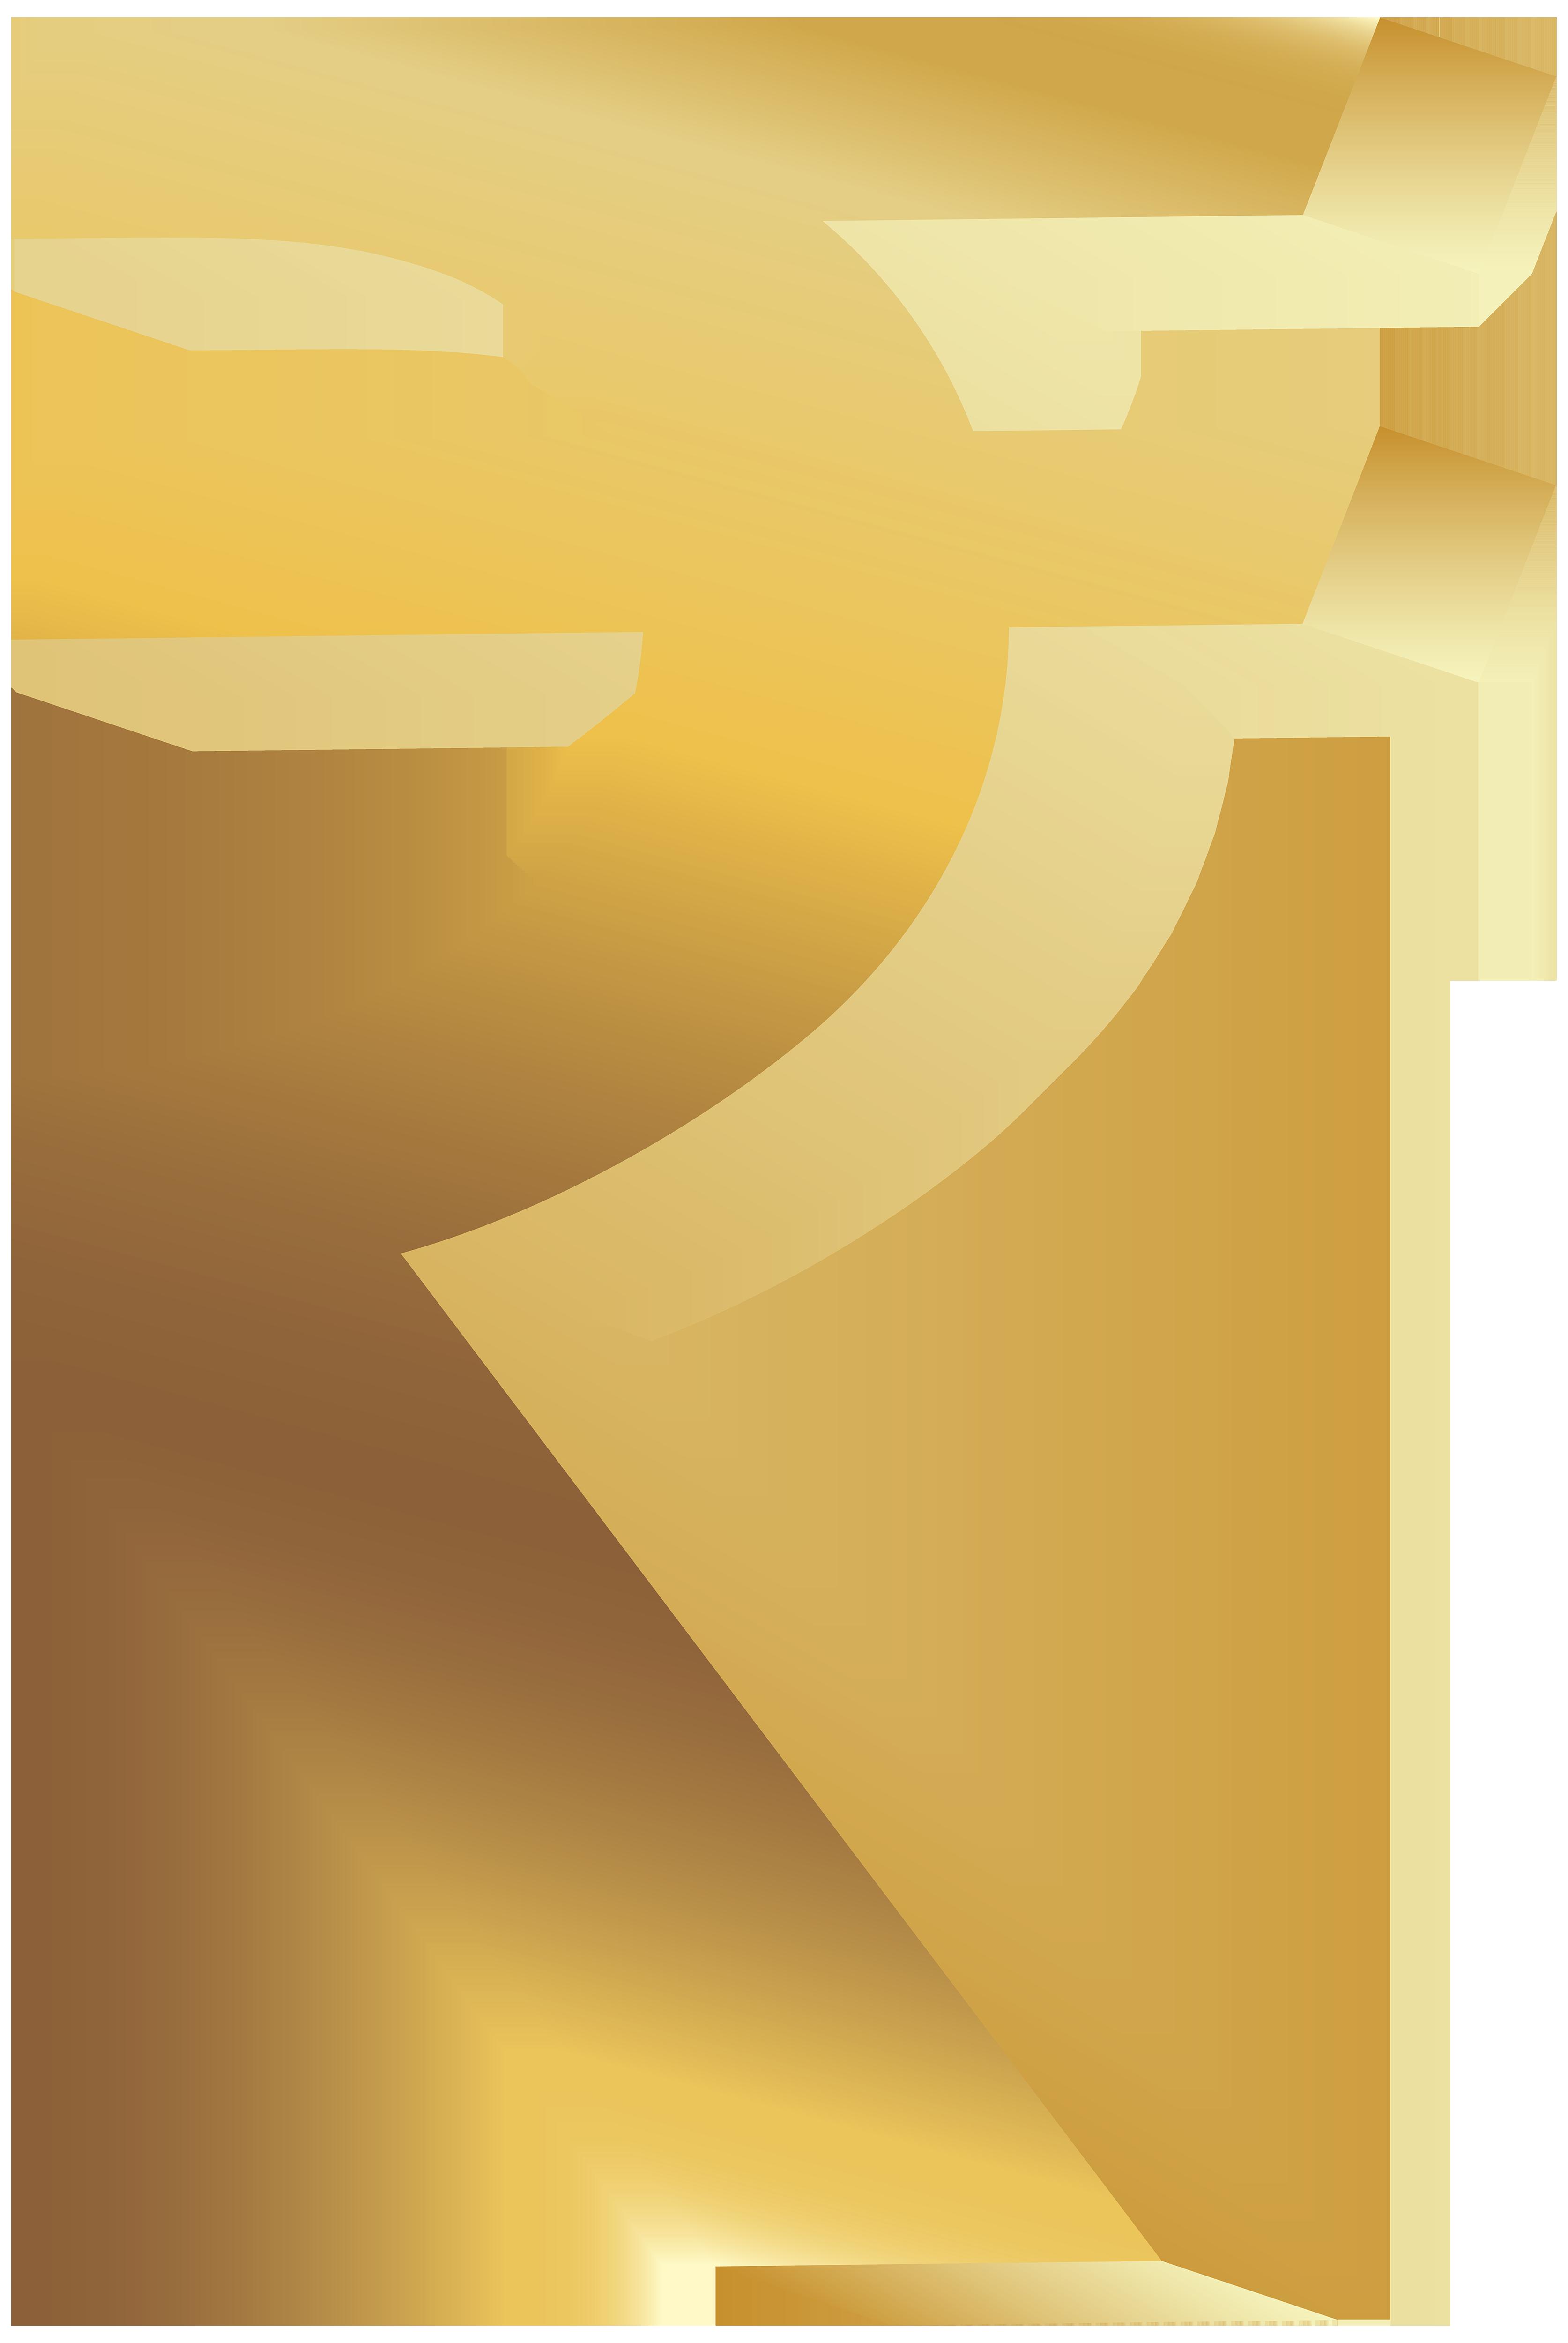 R rupee